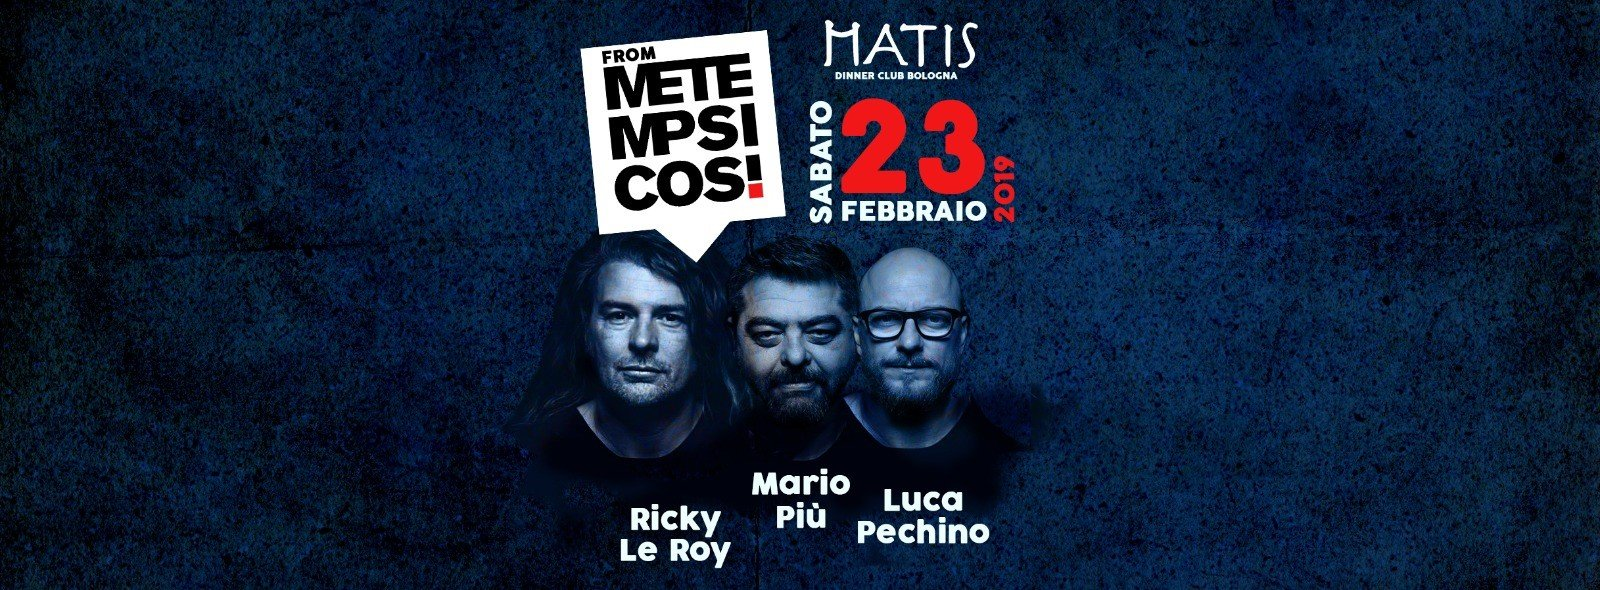 Metempsicosi at Matis Dinner Club Bologna